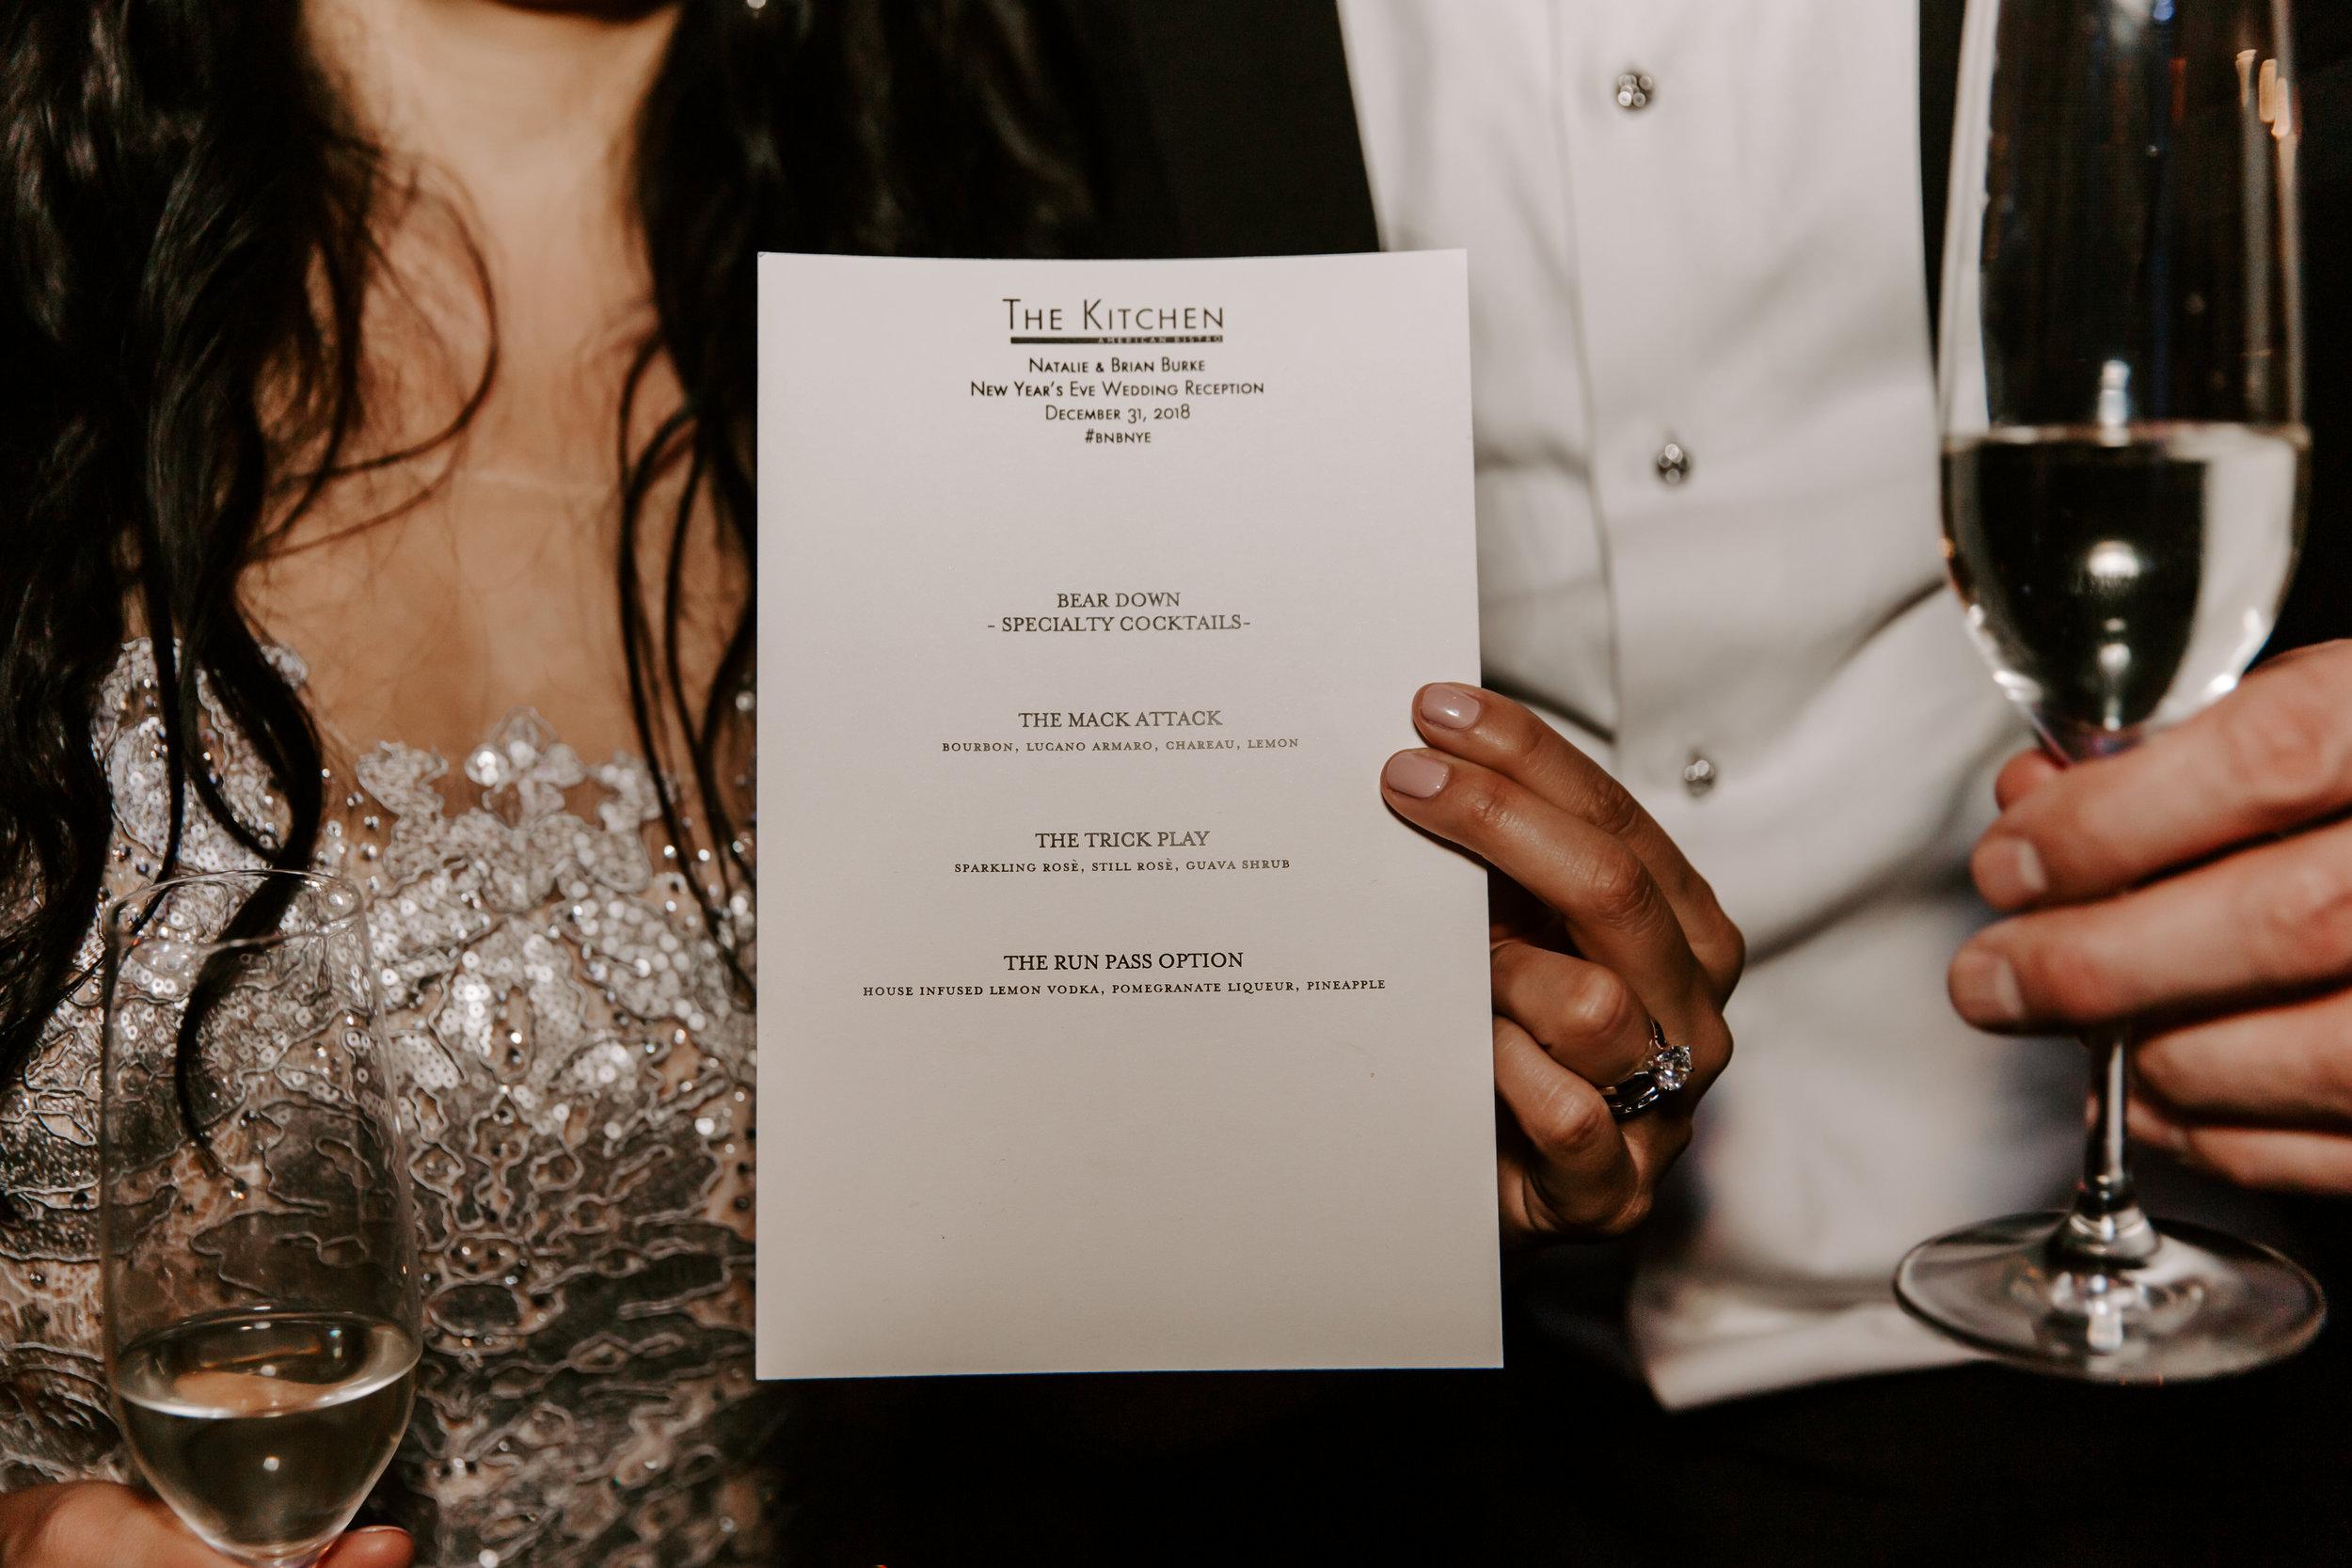 BRIAN + NATALIE - NYE Wedding reception at The Kitchen - Chicago, IL